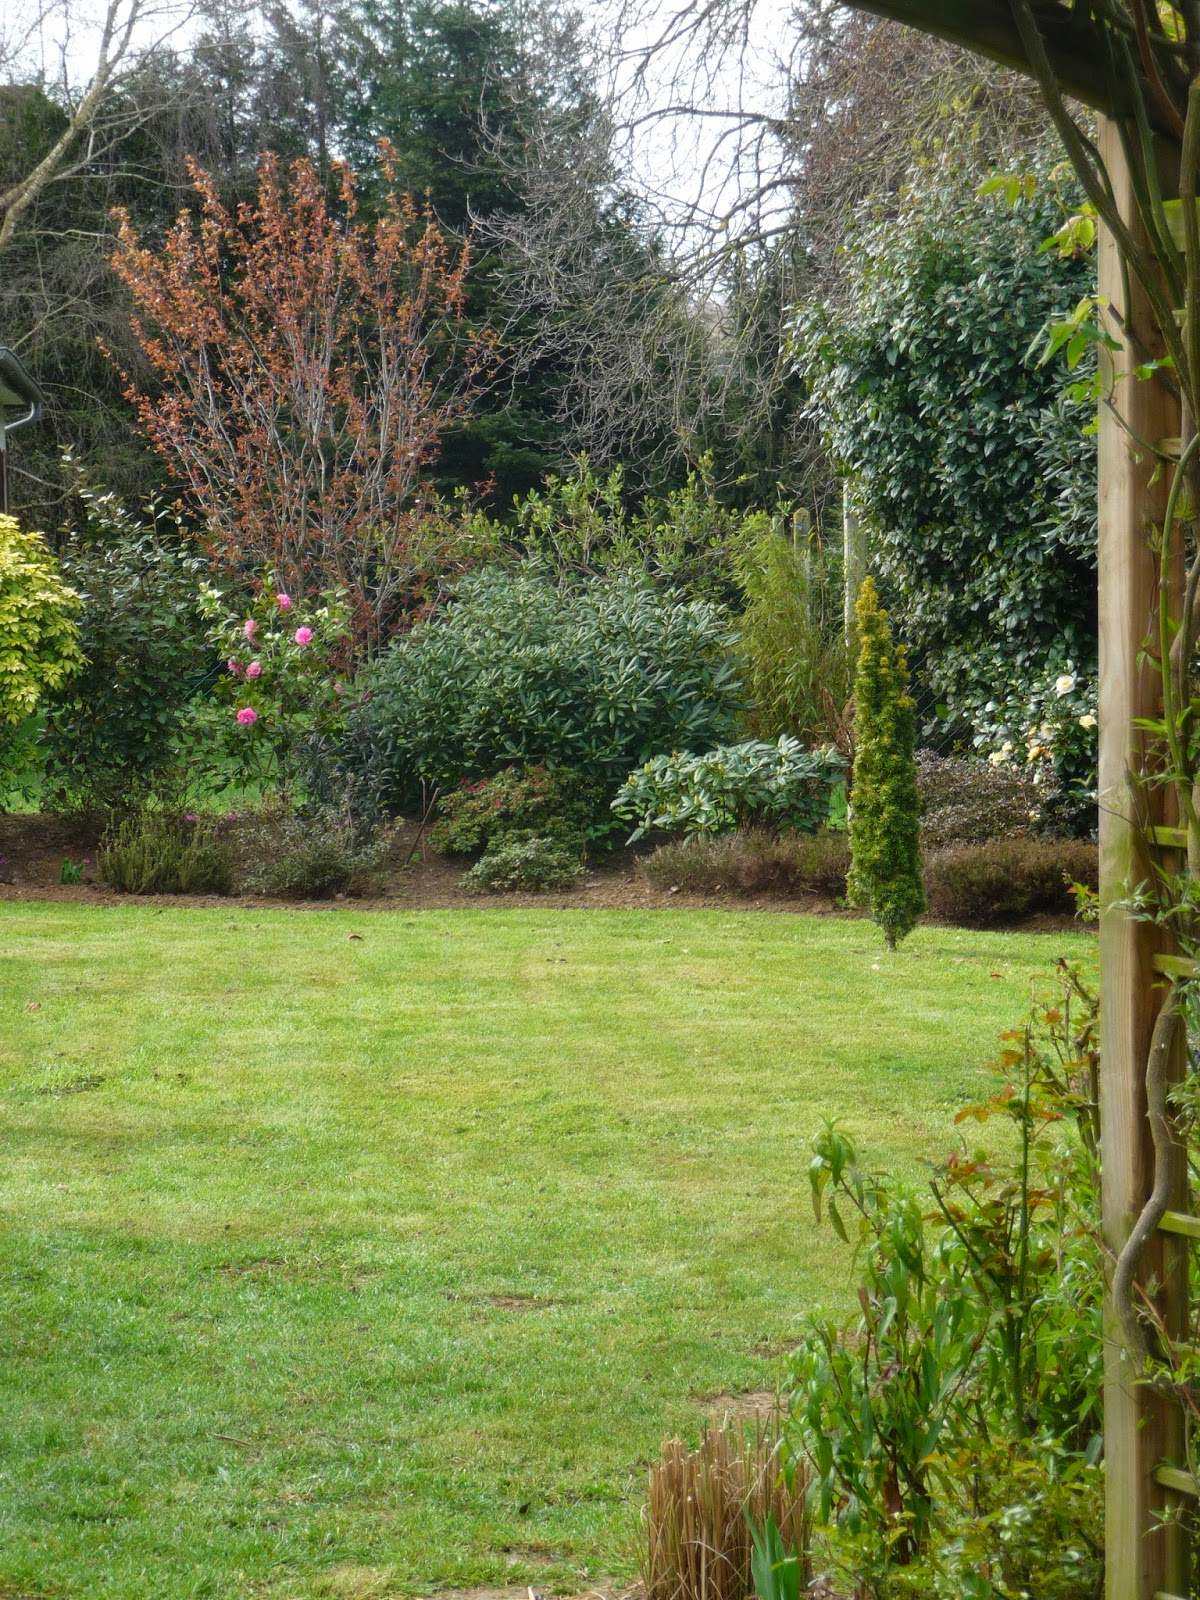 ma terre de bruy re le jardin reprend doucement vie. Black Bedroom Furniture Sets. Home Design Ideas